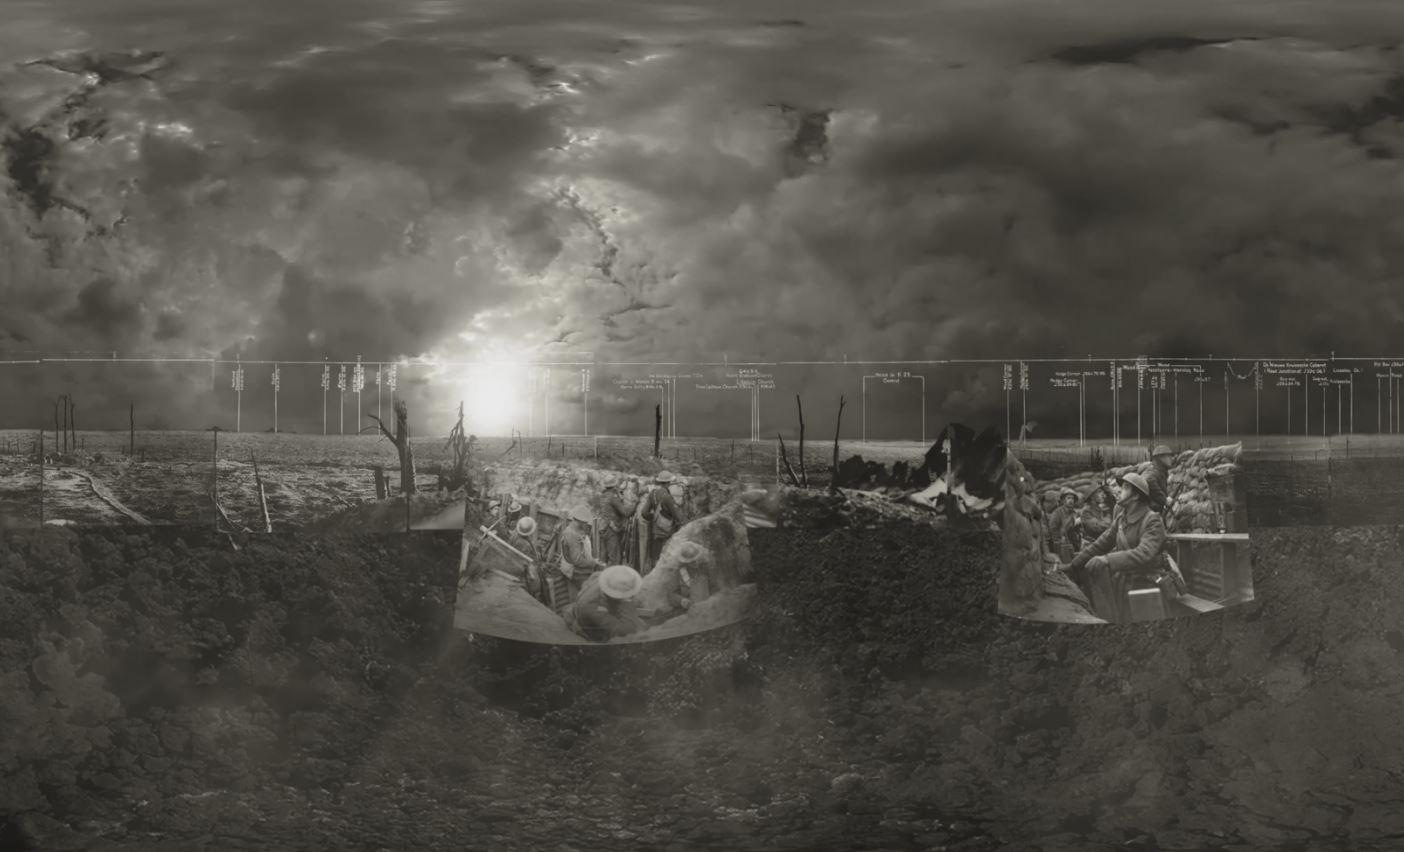 360-degree video recreates the Battle of Passchendaele